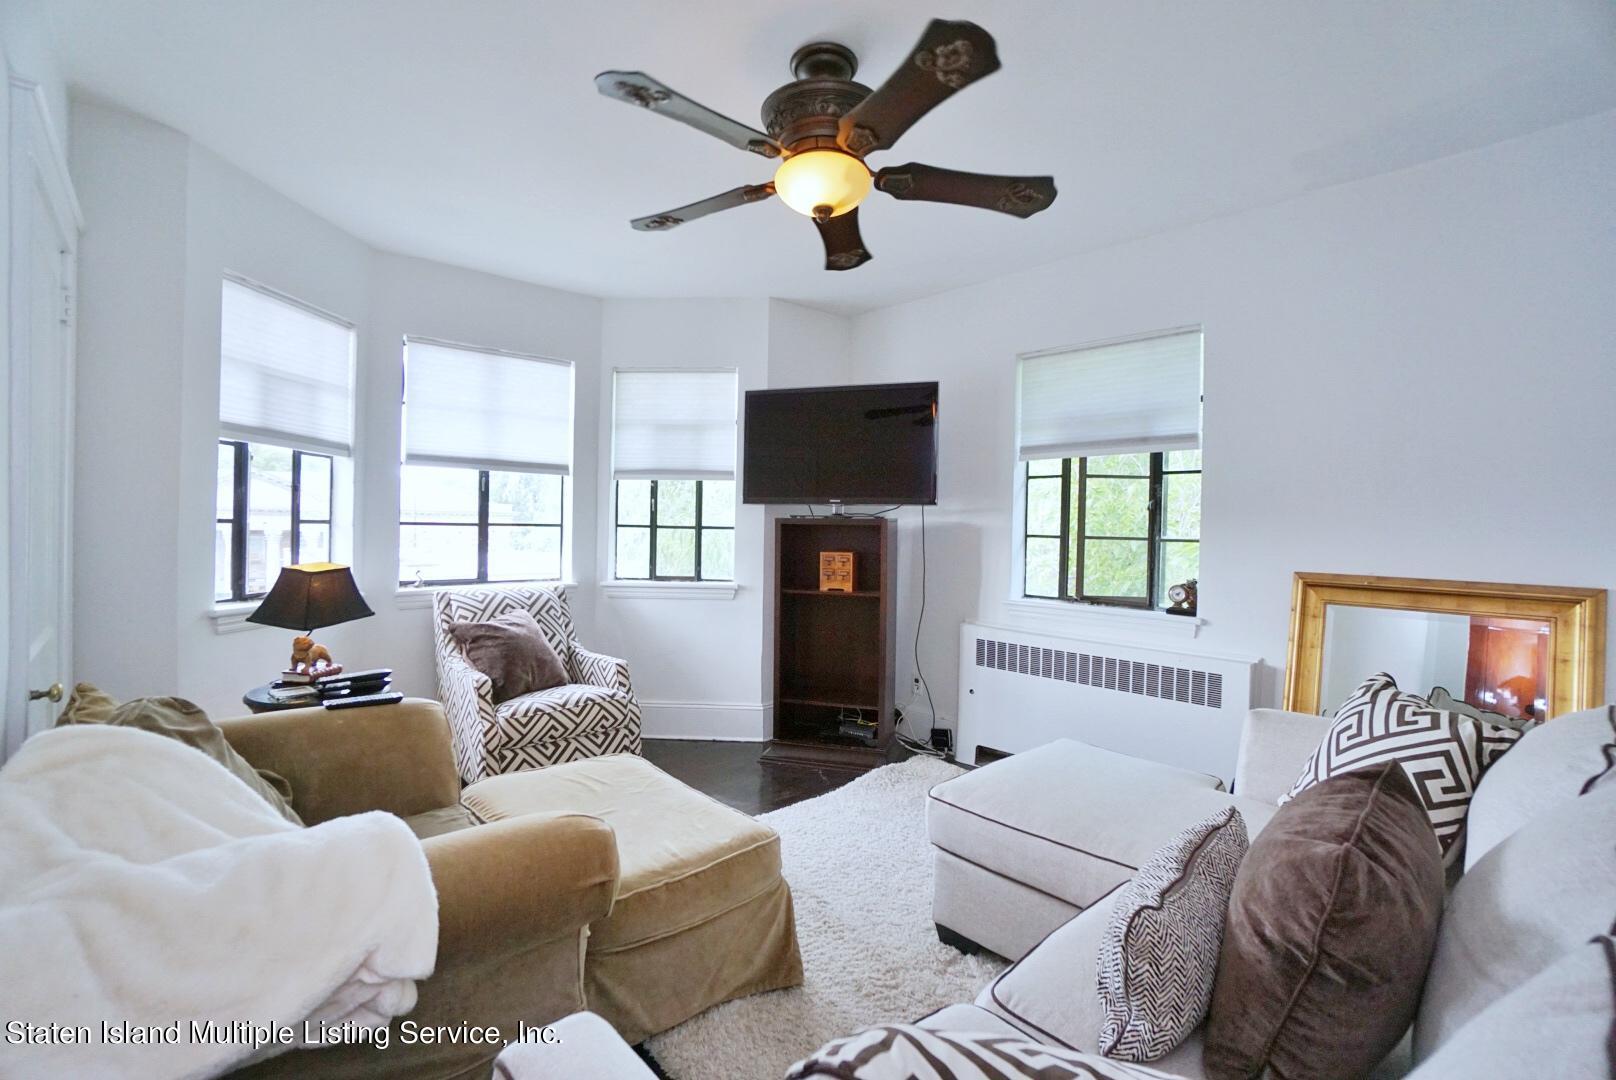 Single Family - Detached 311 Bement Avenue  Staten Island, NY 10310, MLS-1147133-29